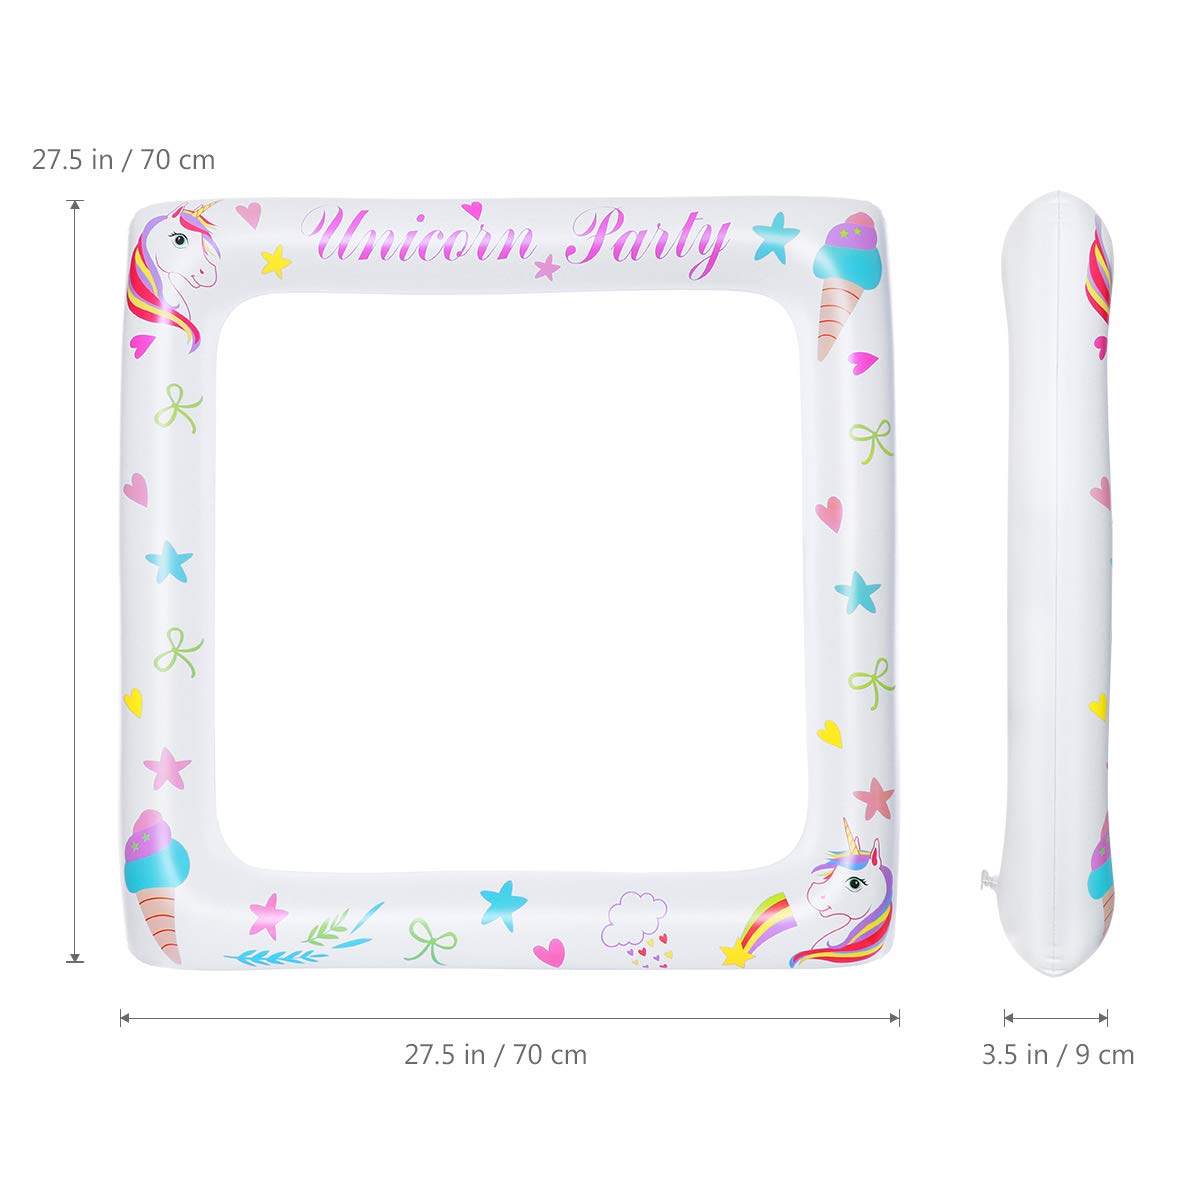 Amosfun Marco de unicornio Accesorios de fotomatón Marco de fiesta inflable para cumpleaños de fiesta de bebé (71x71cm)